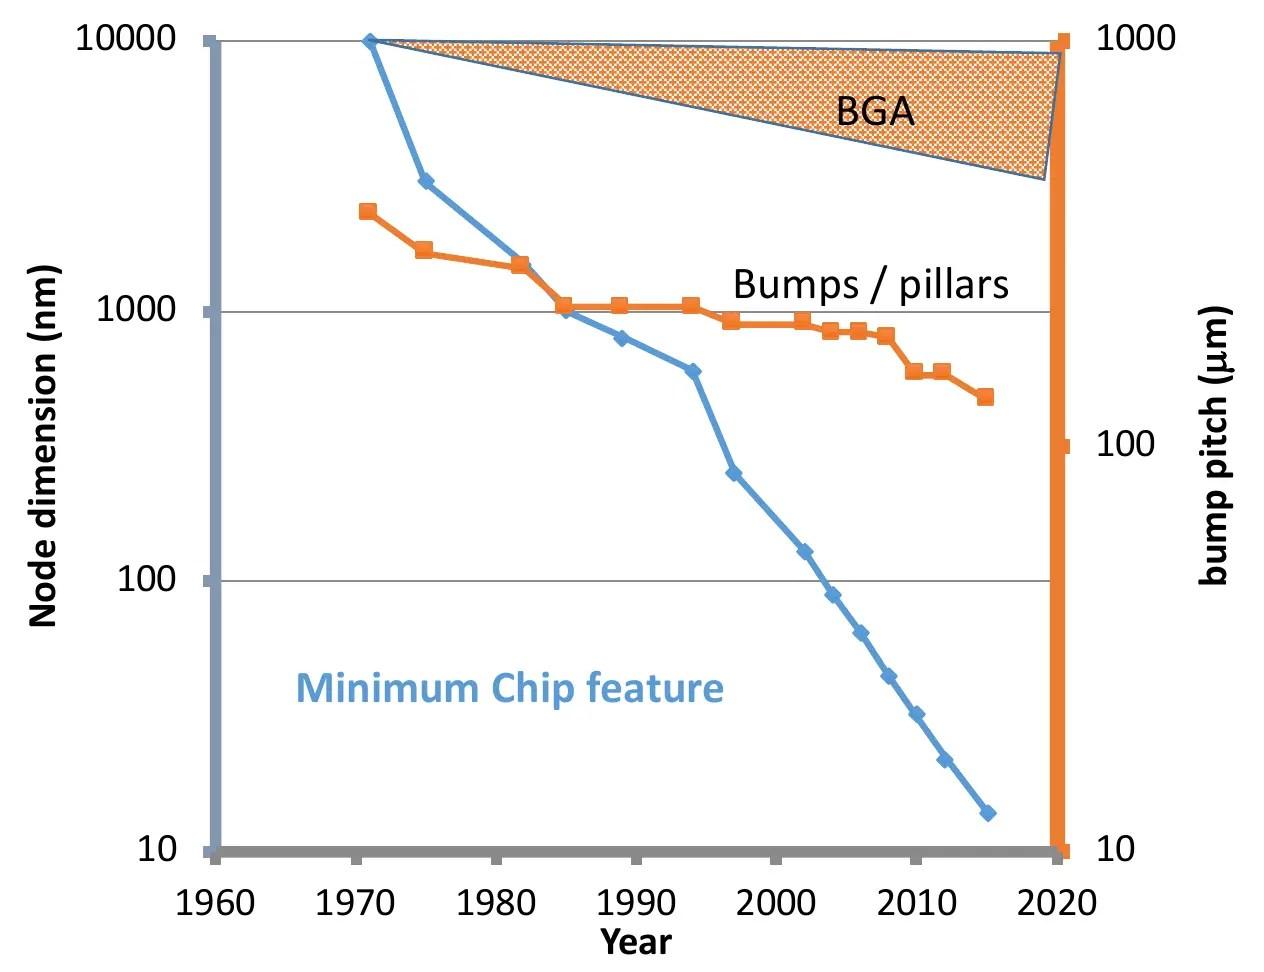 hight resolution of bump pillar scaling iedm 2018